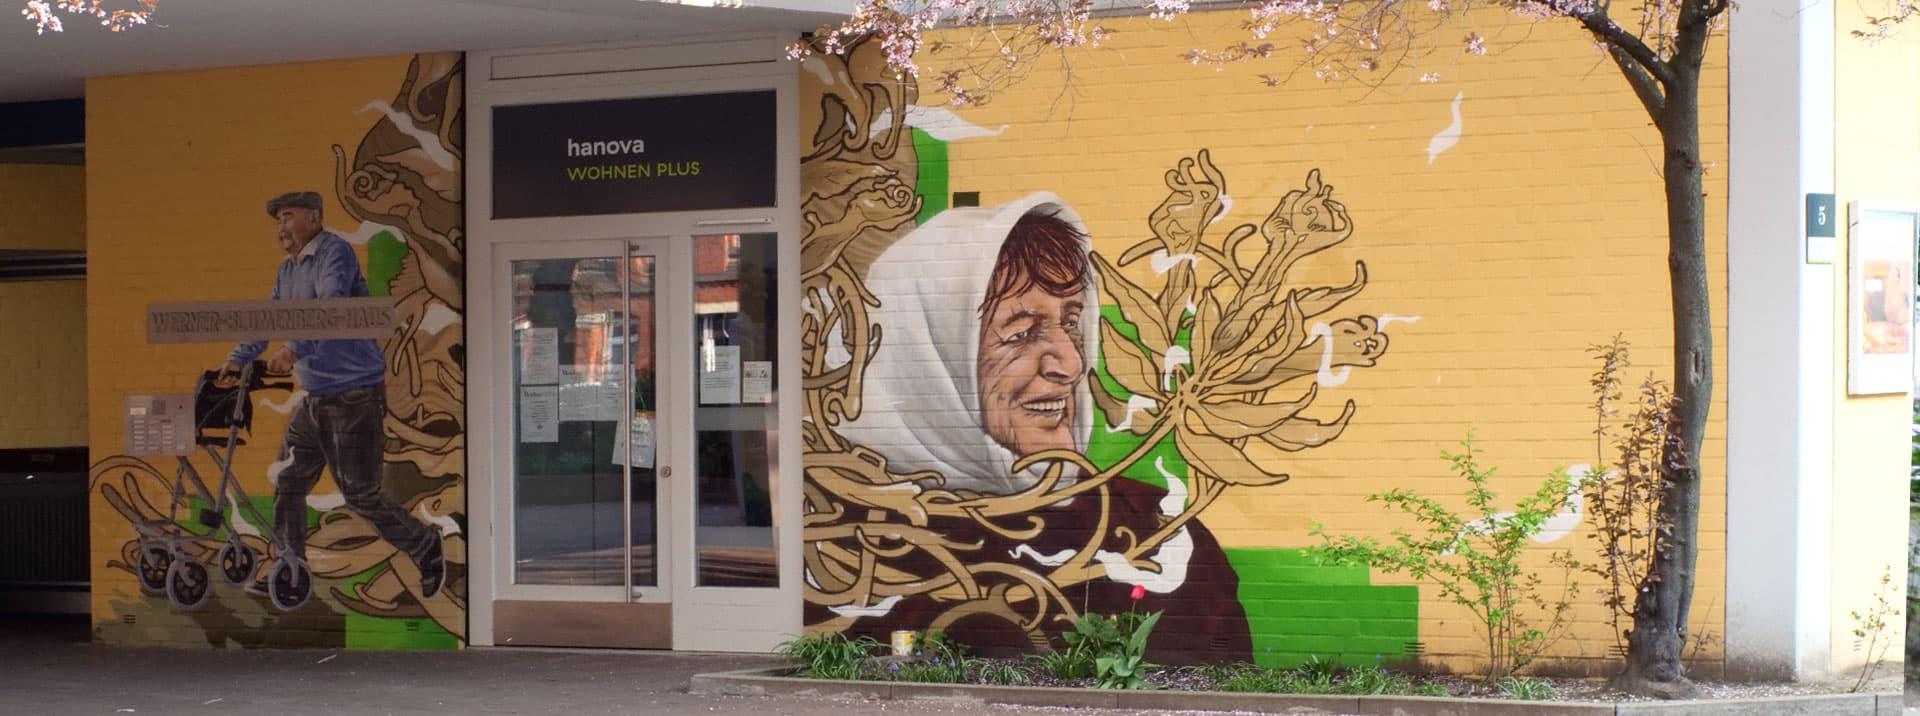 Wohngruppe Senioren Graffiti